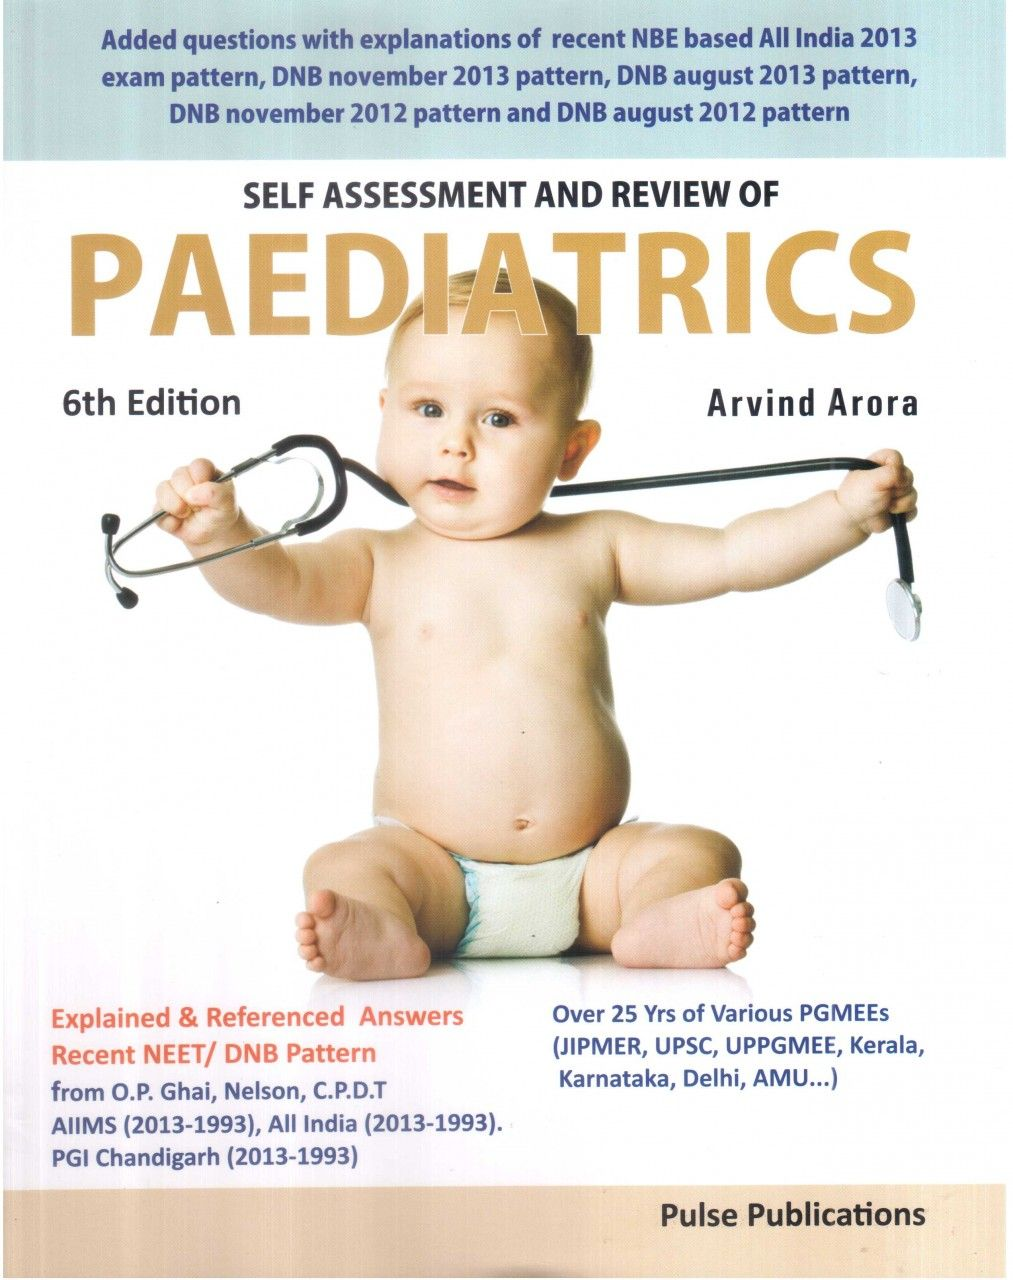 Pin by Ishika Shah on Medical Books in 2019 | Pediatrics